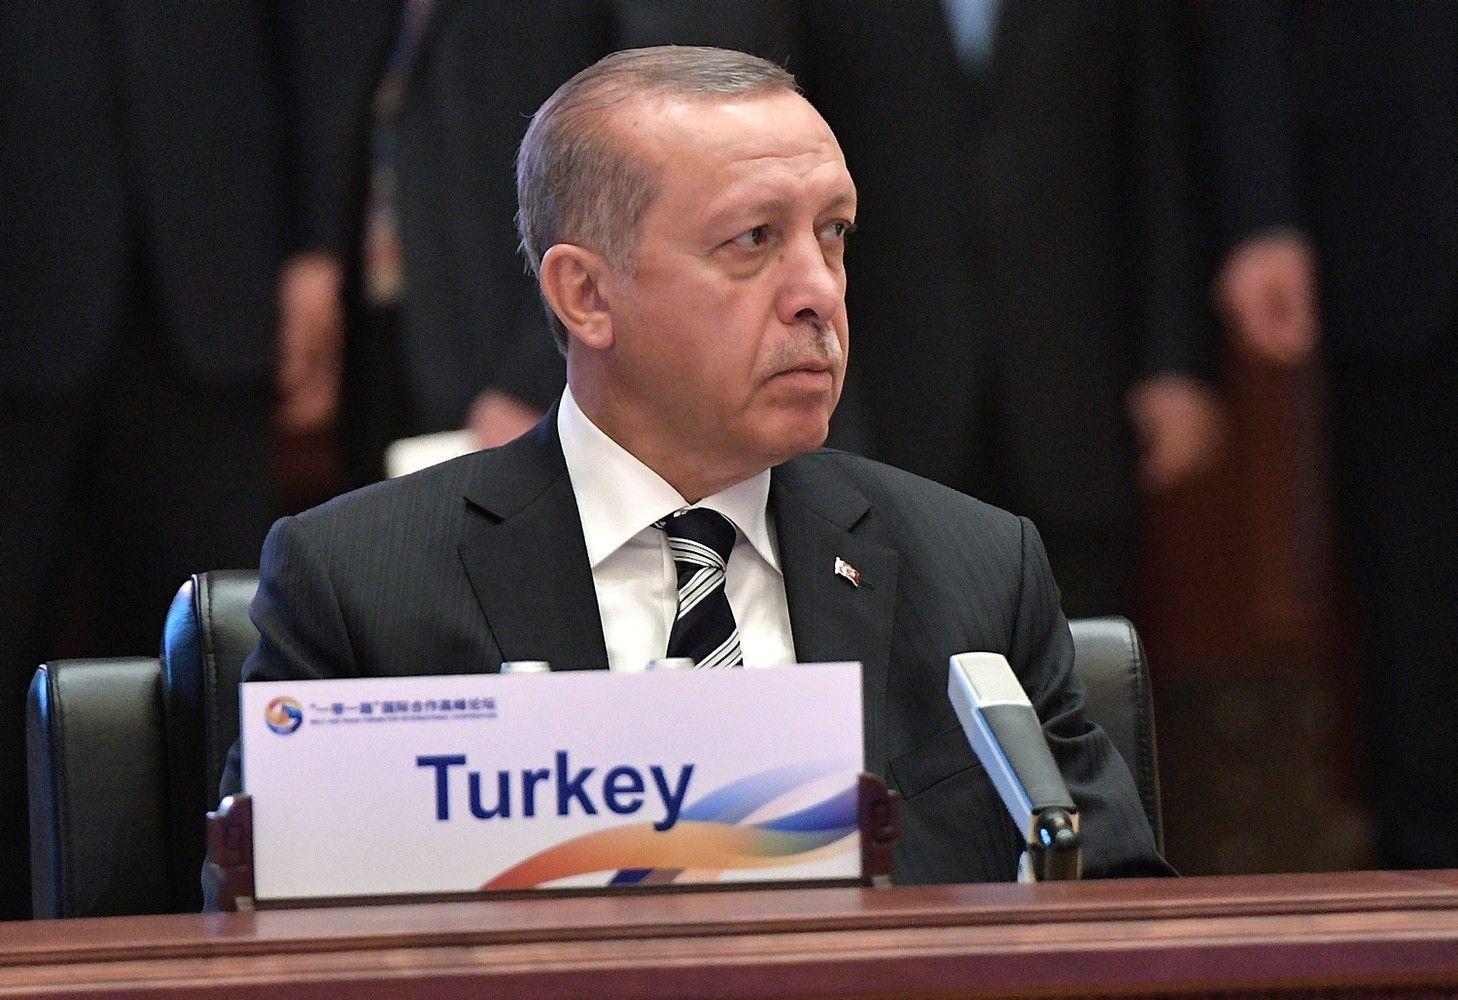 Po rimto konflikto su Berlynu, Erdoganas vyksta susitikti su Trumpu